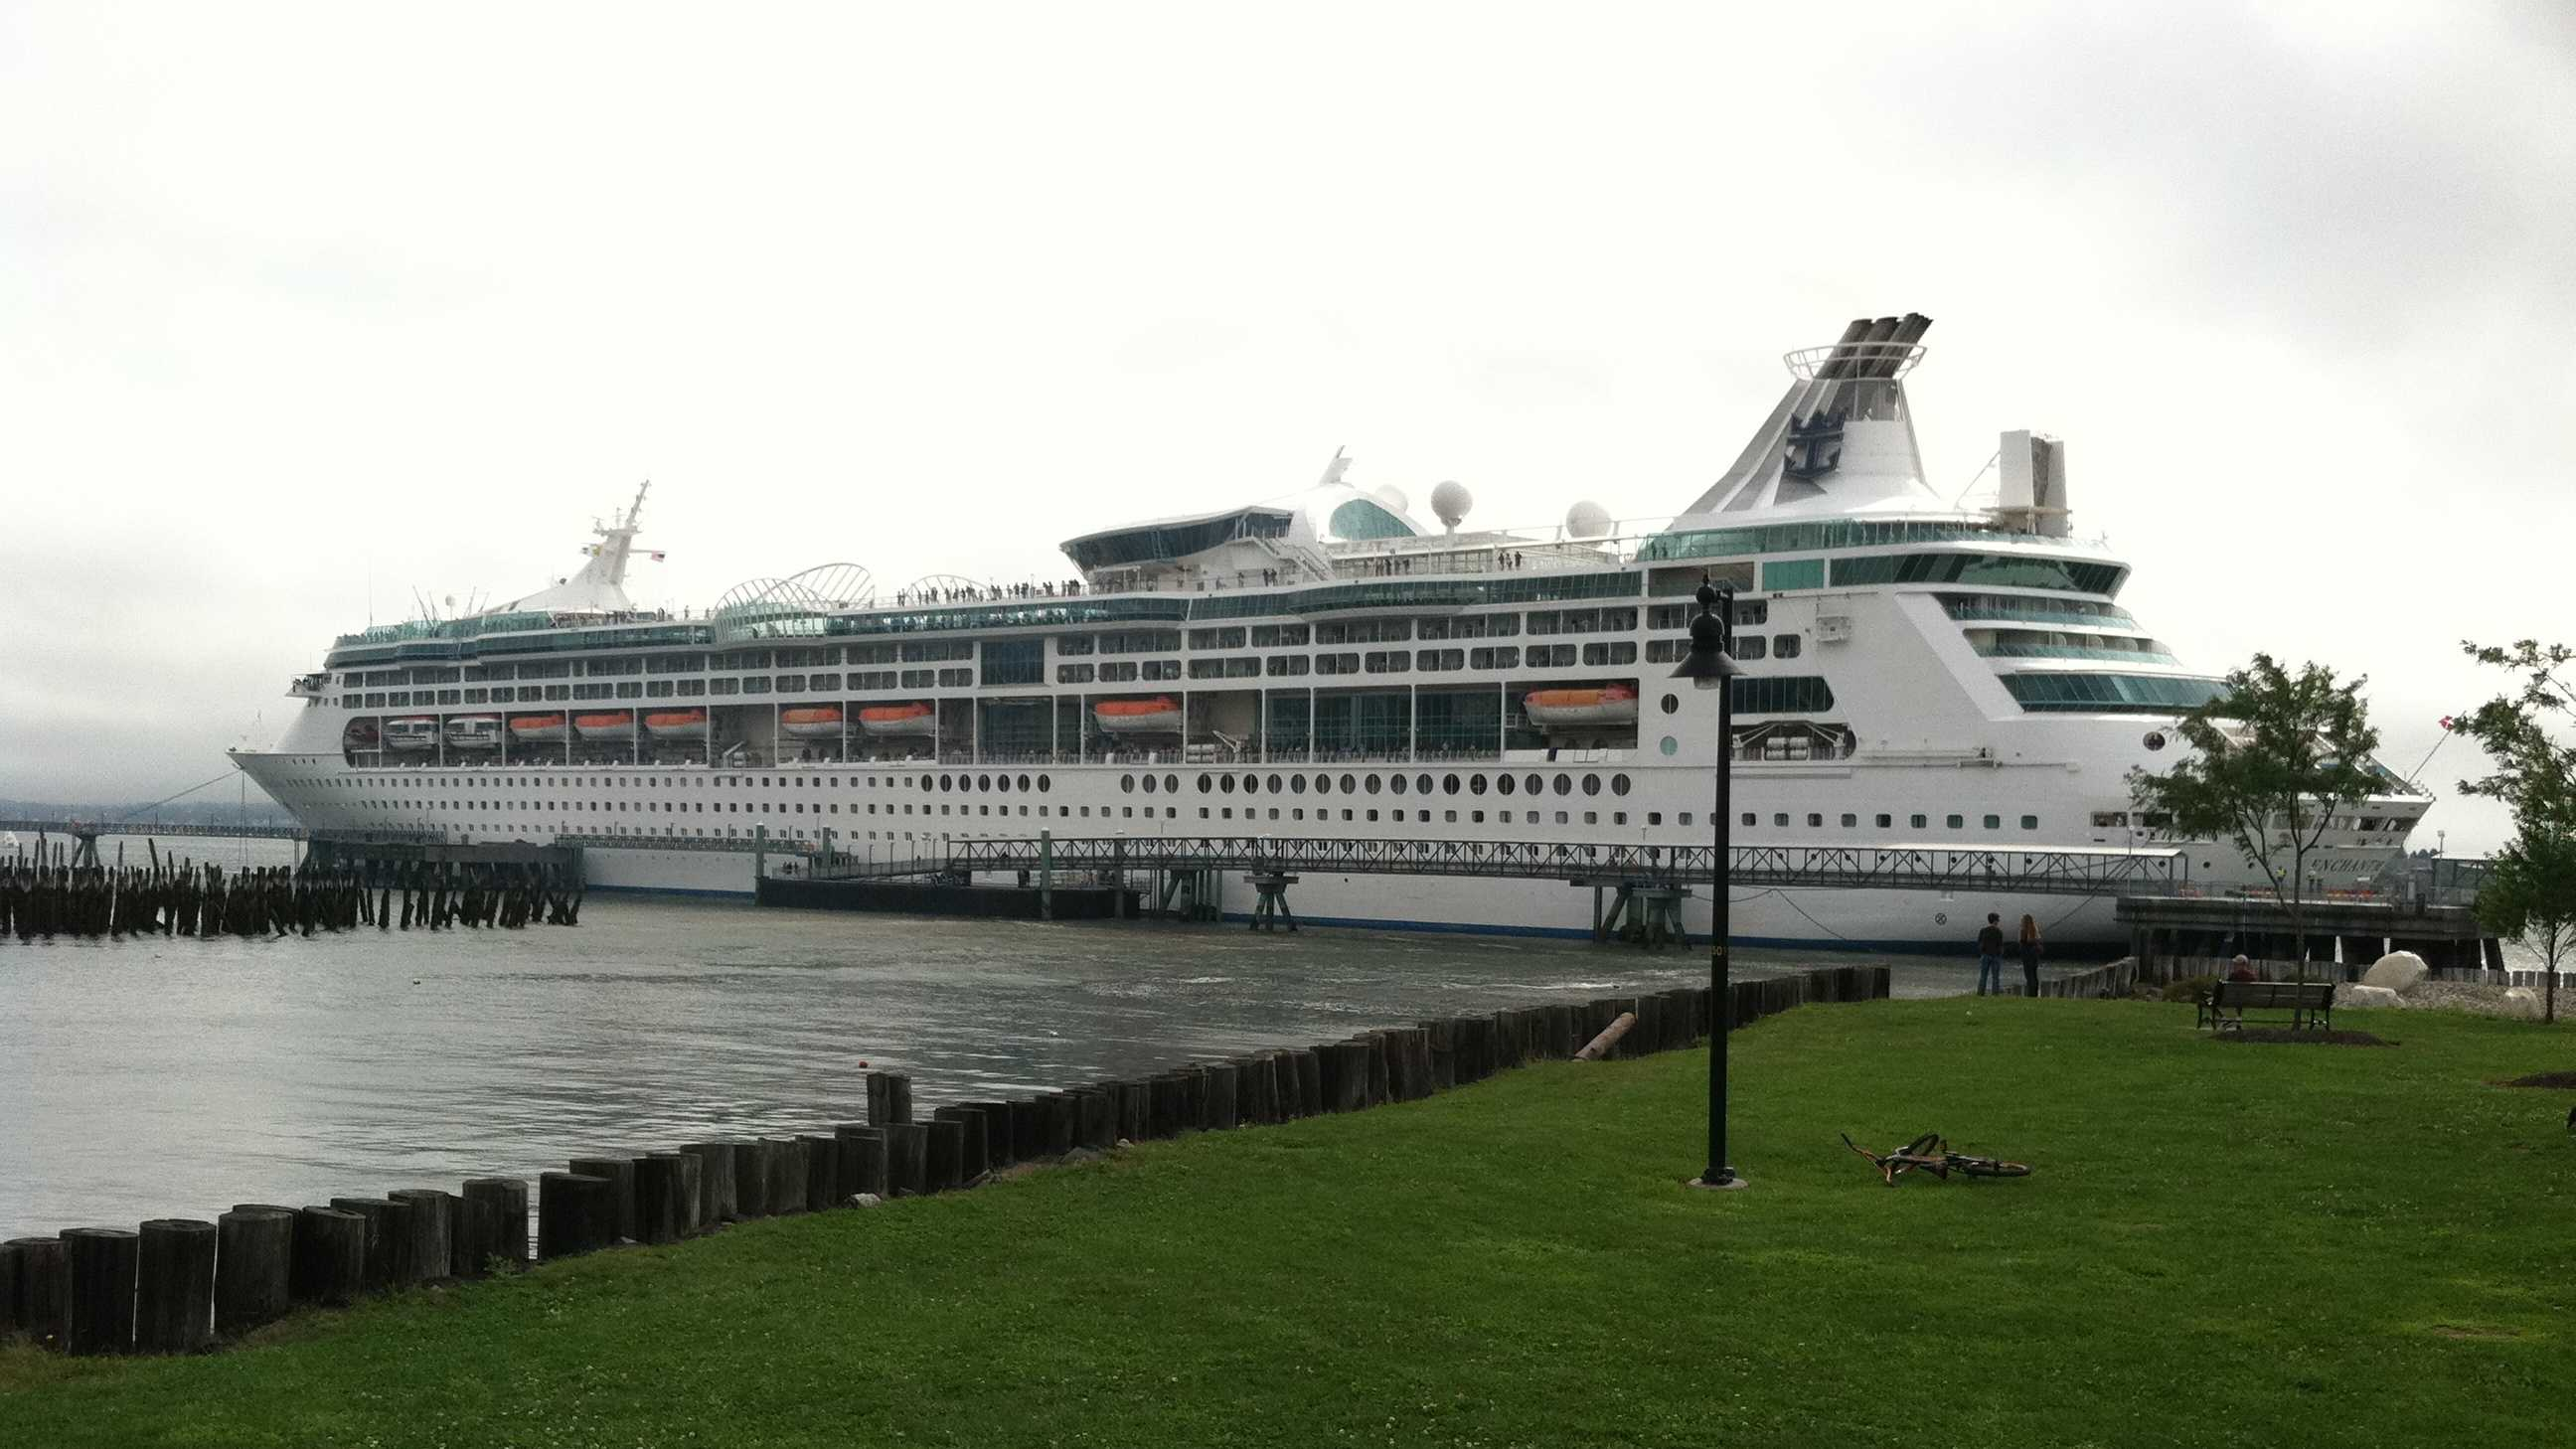 The Enchantment of the Seas is a Royal Caribbean International ship.